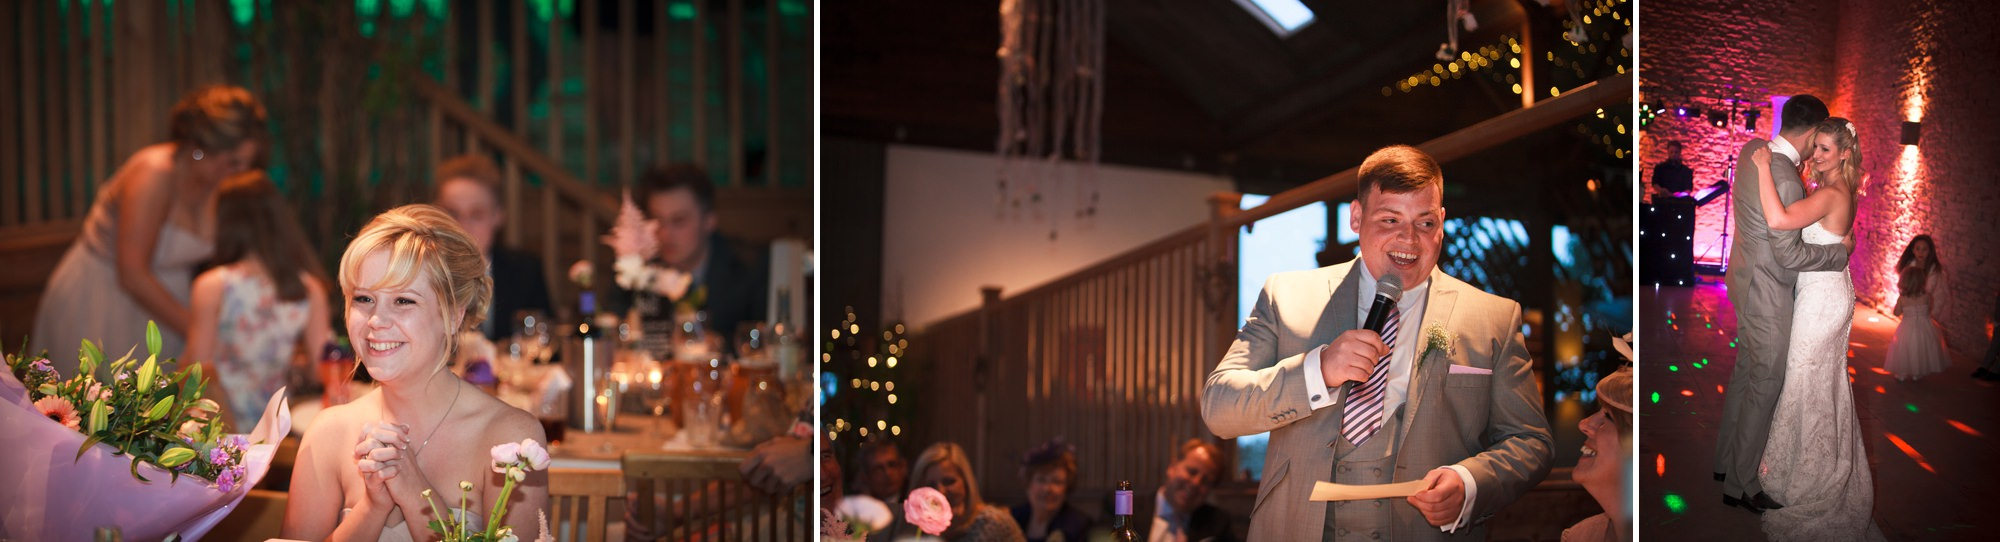 stone-barn-wedding-15